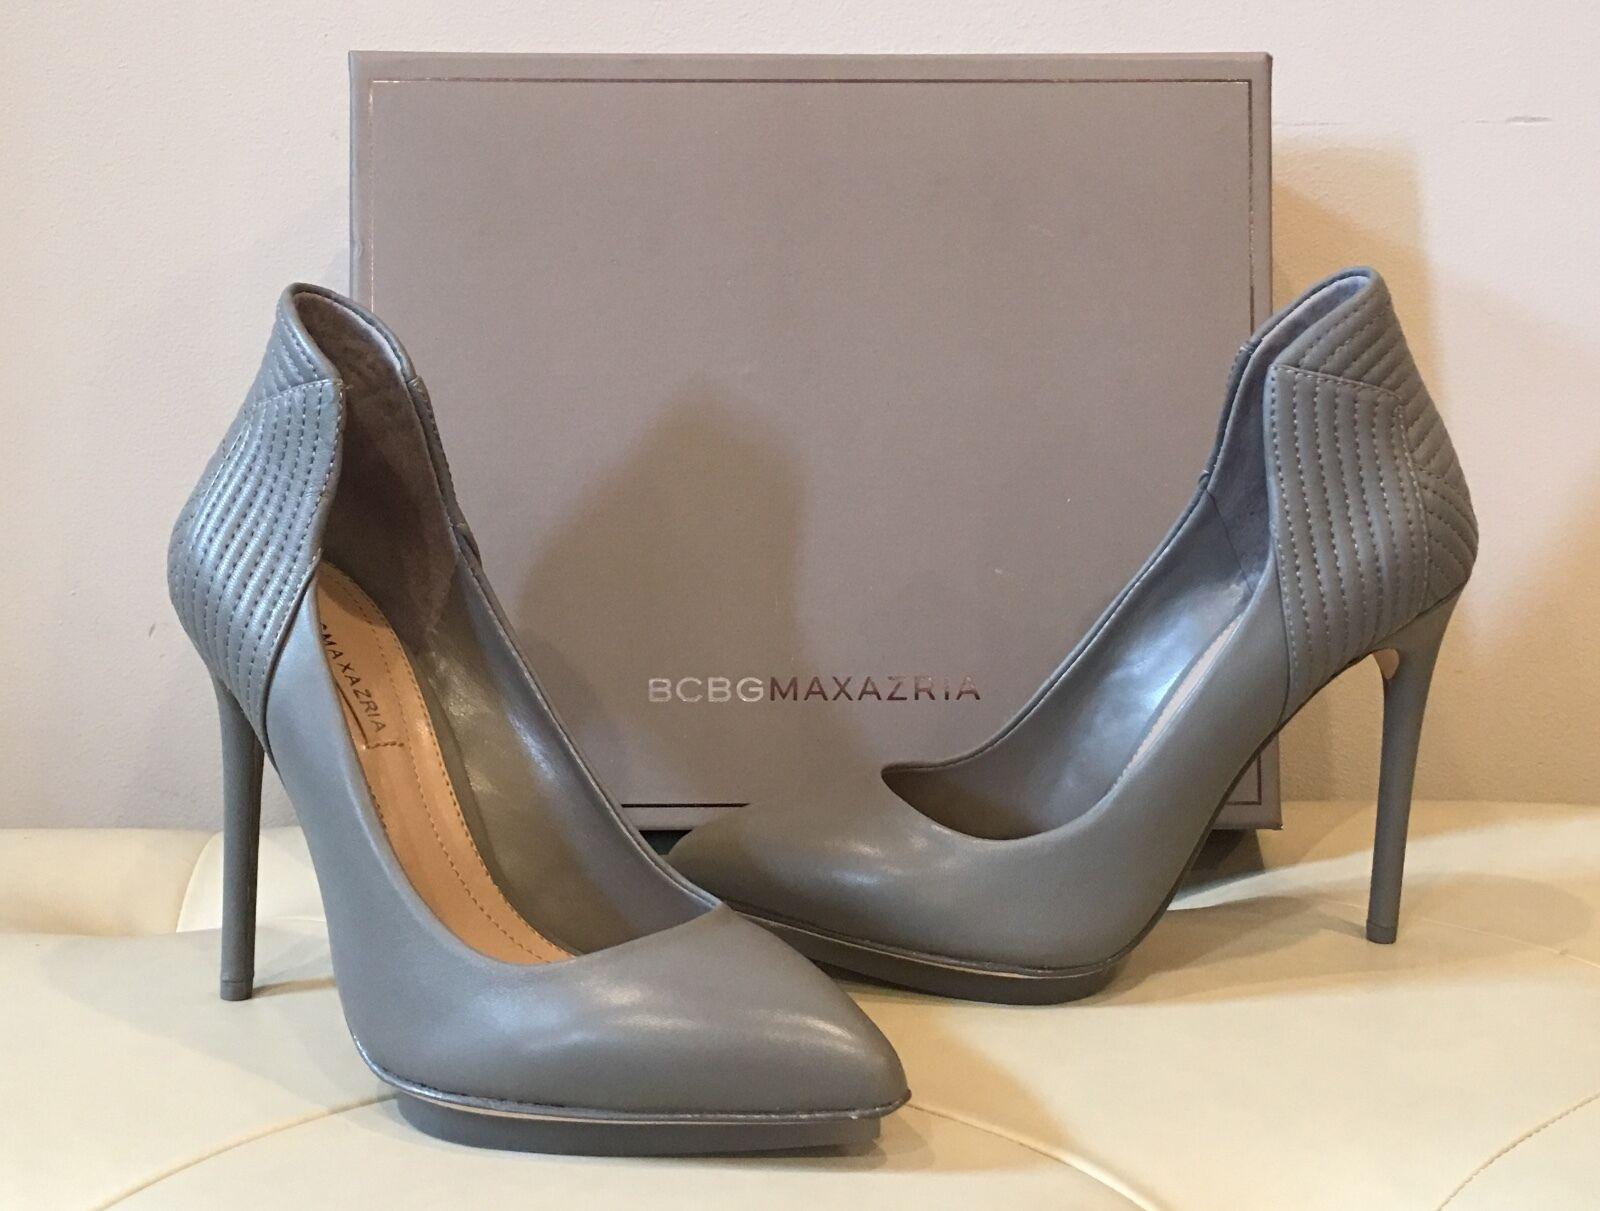 BCBGMAXAZRIA Wouomo Ma-Abbott Dress Pump scarpe grigio Dusk 7M